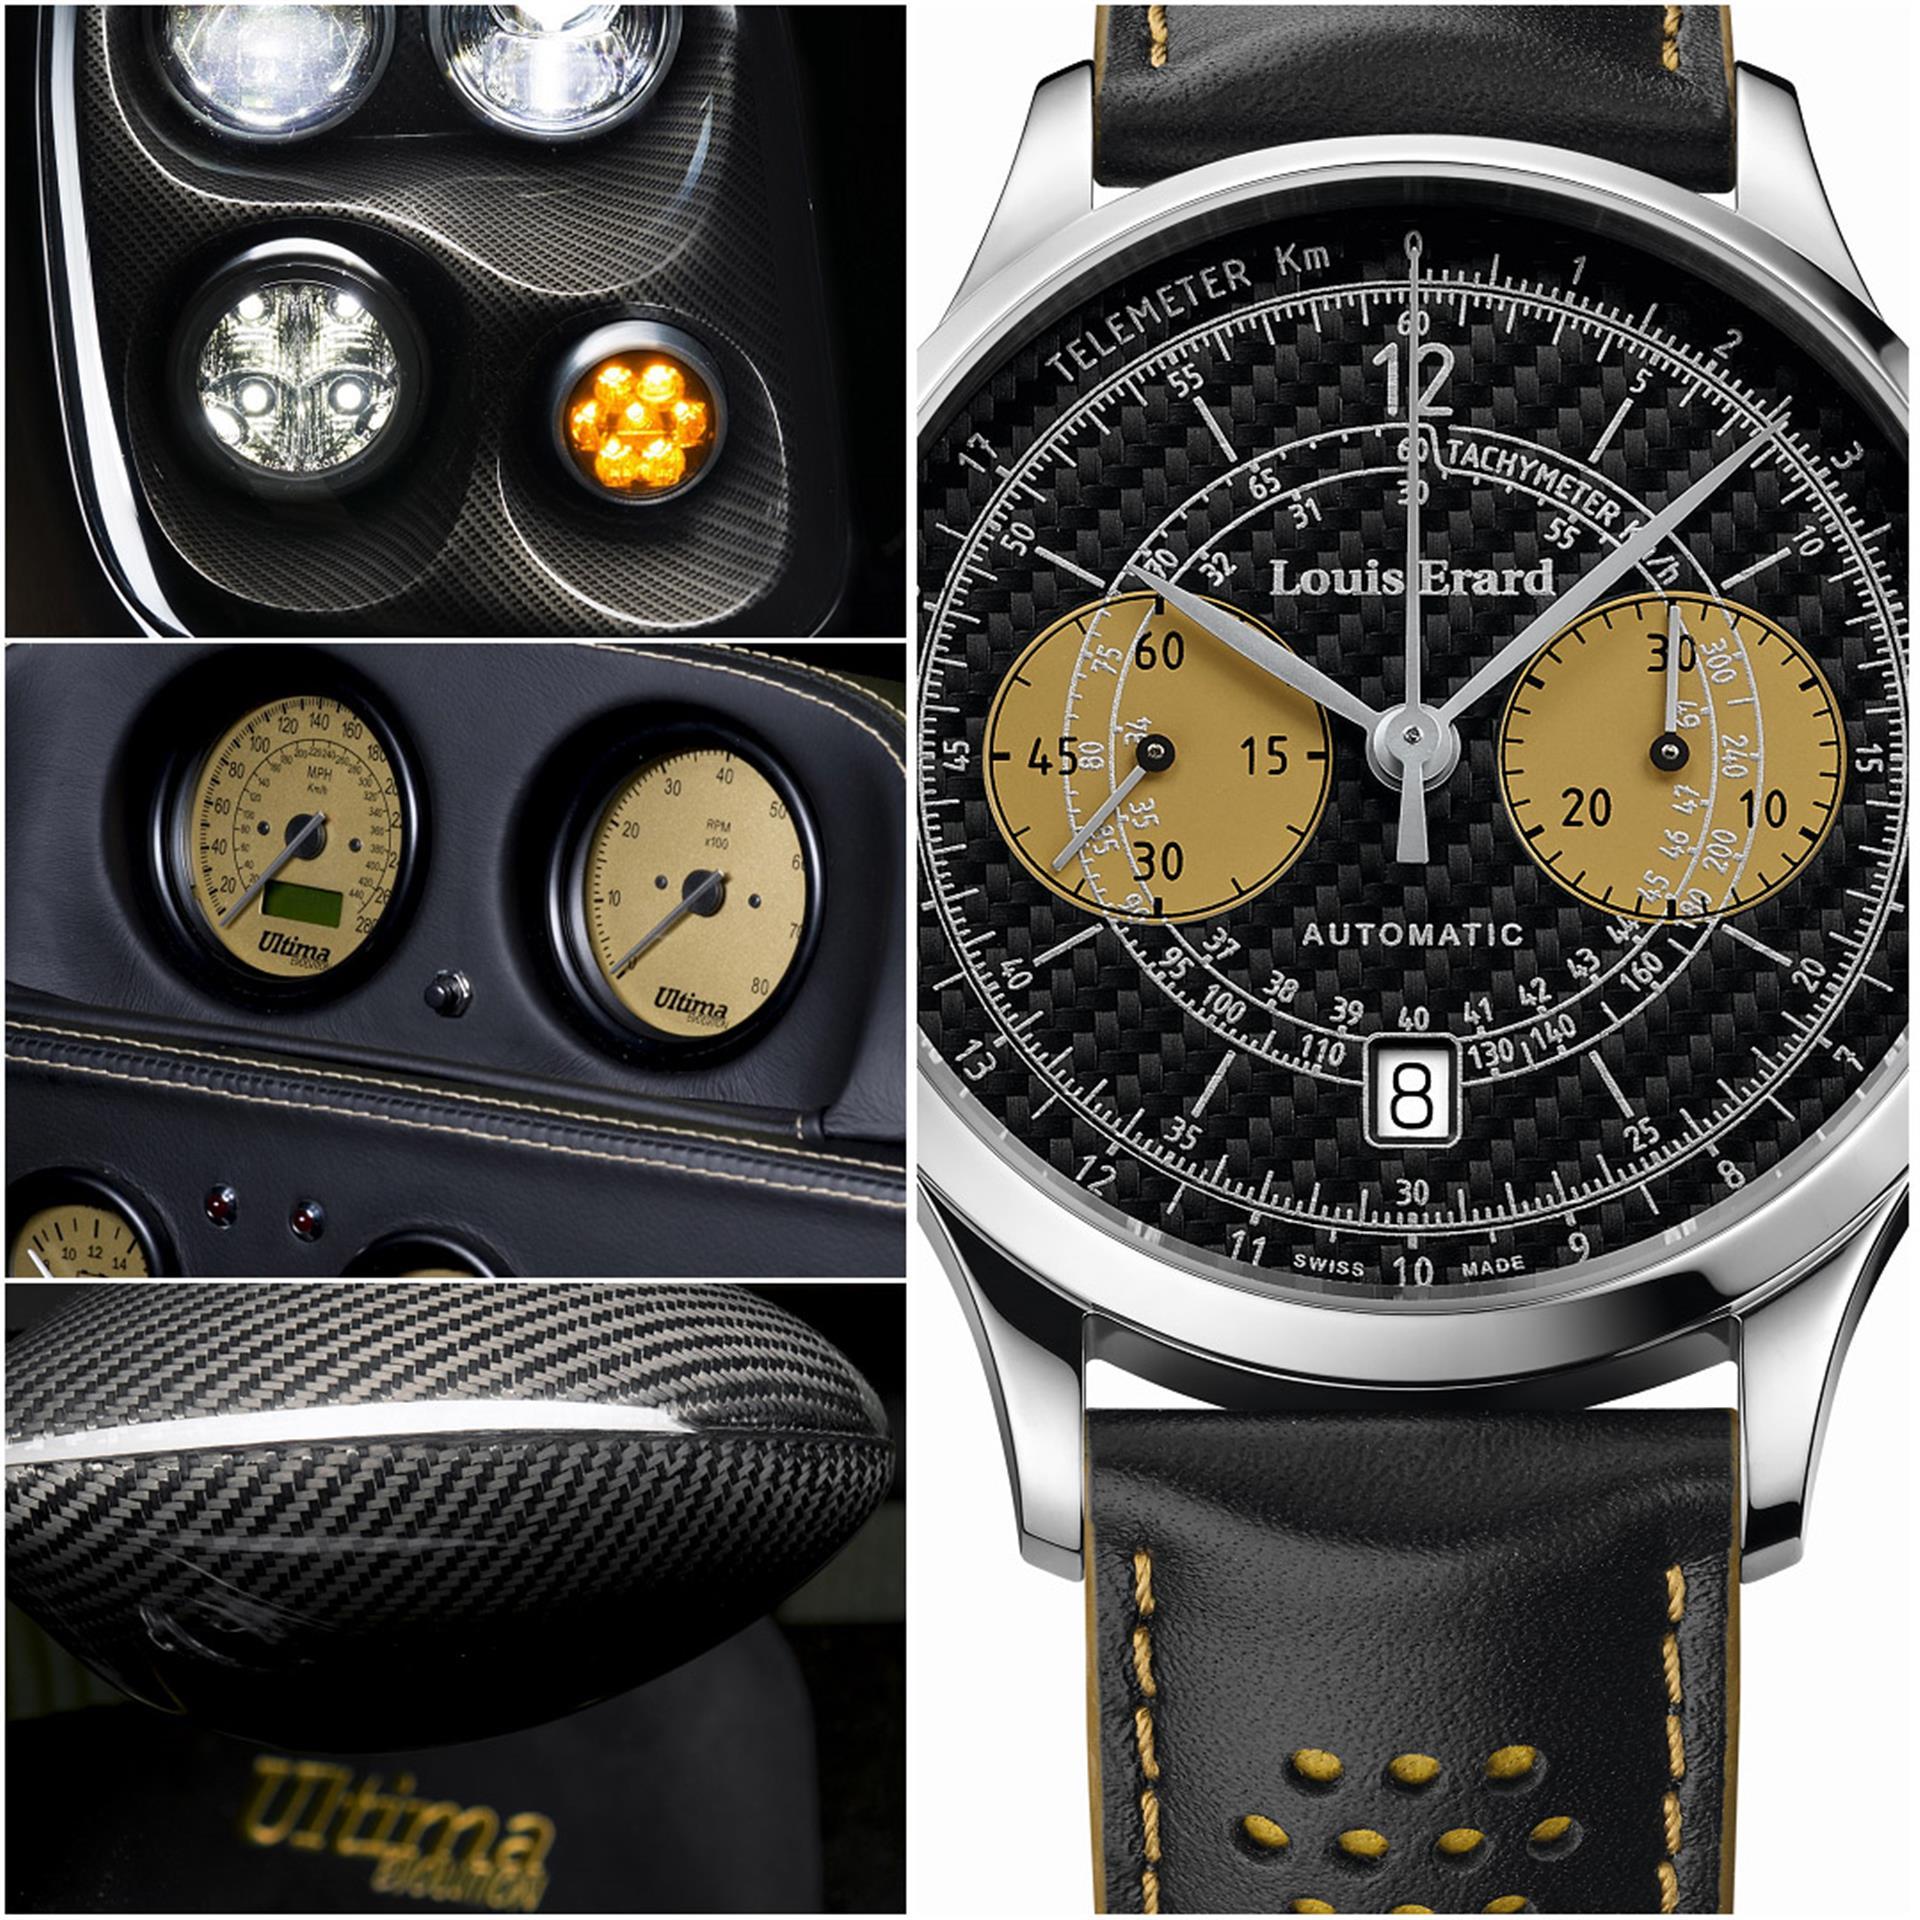 Louis Erard Ultima Watch